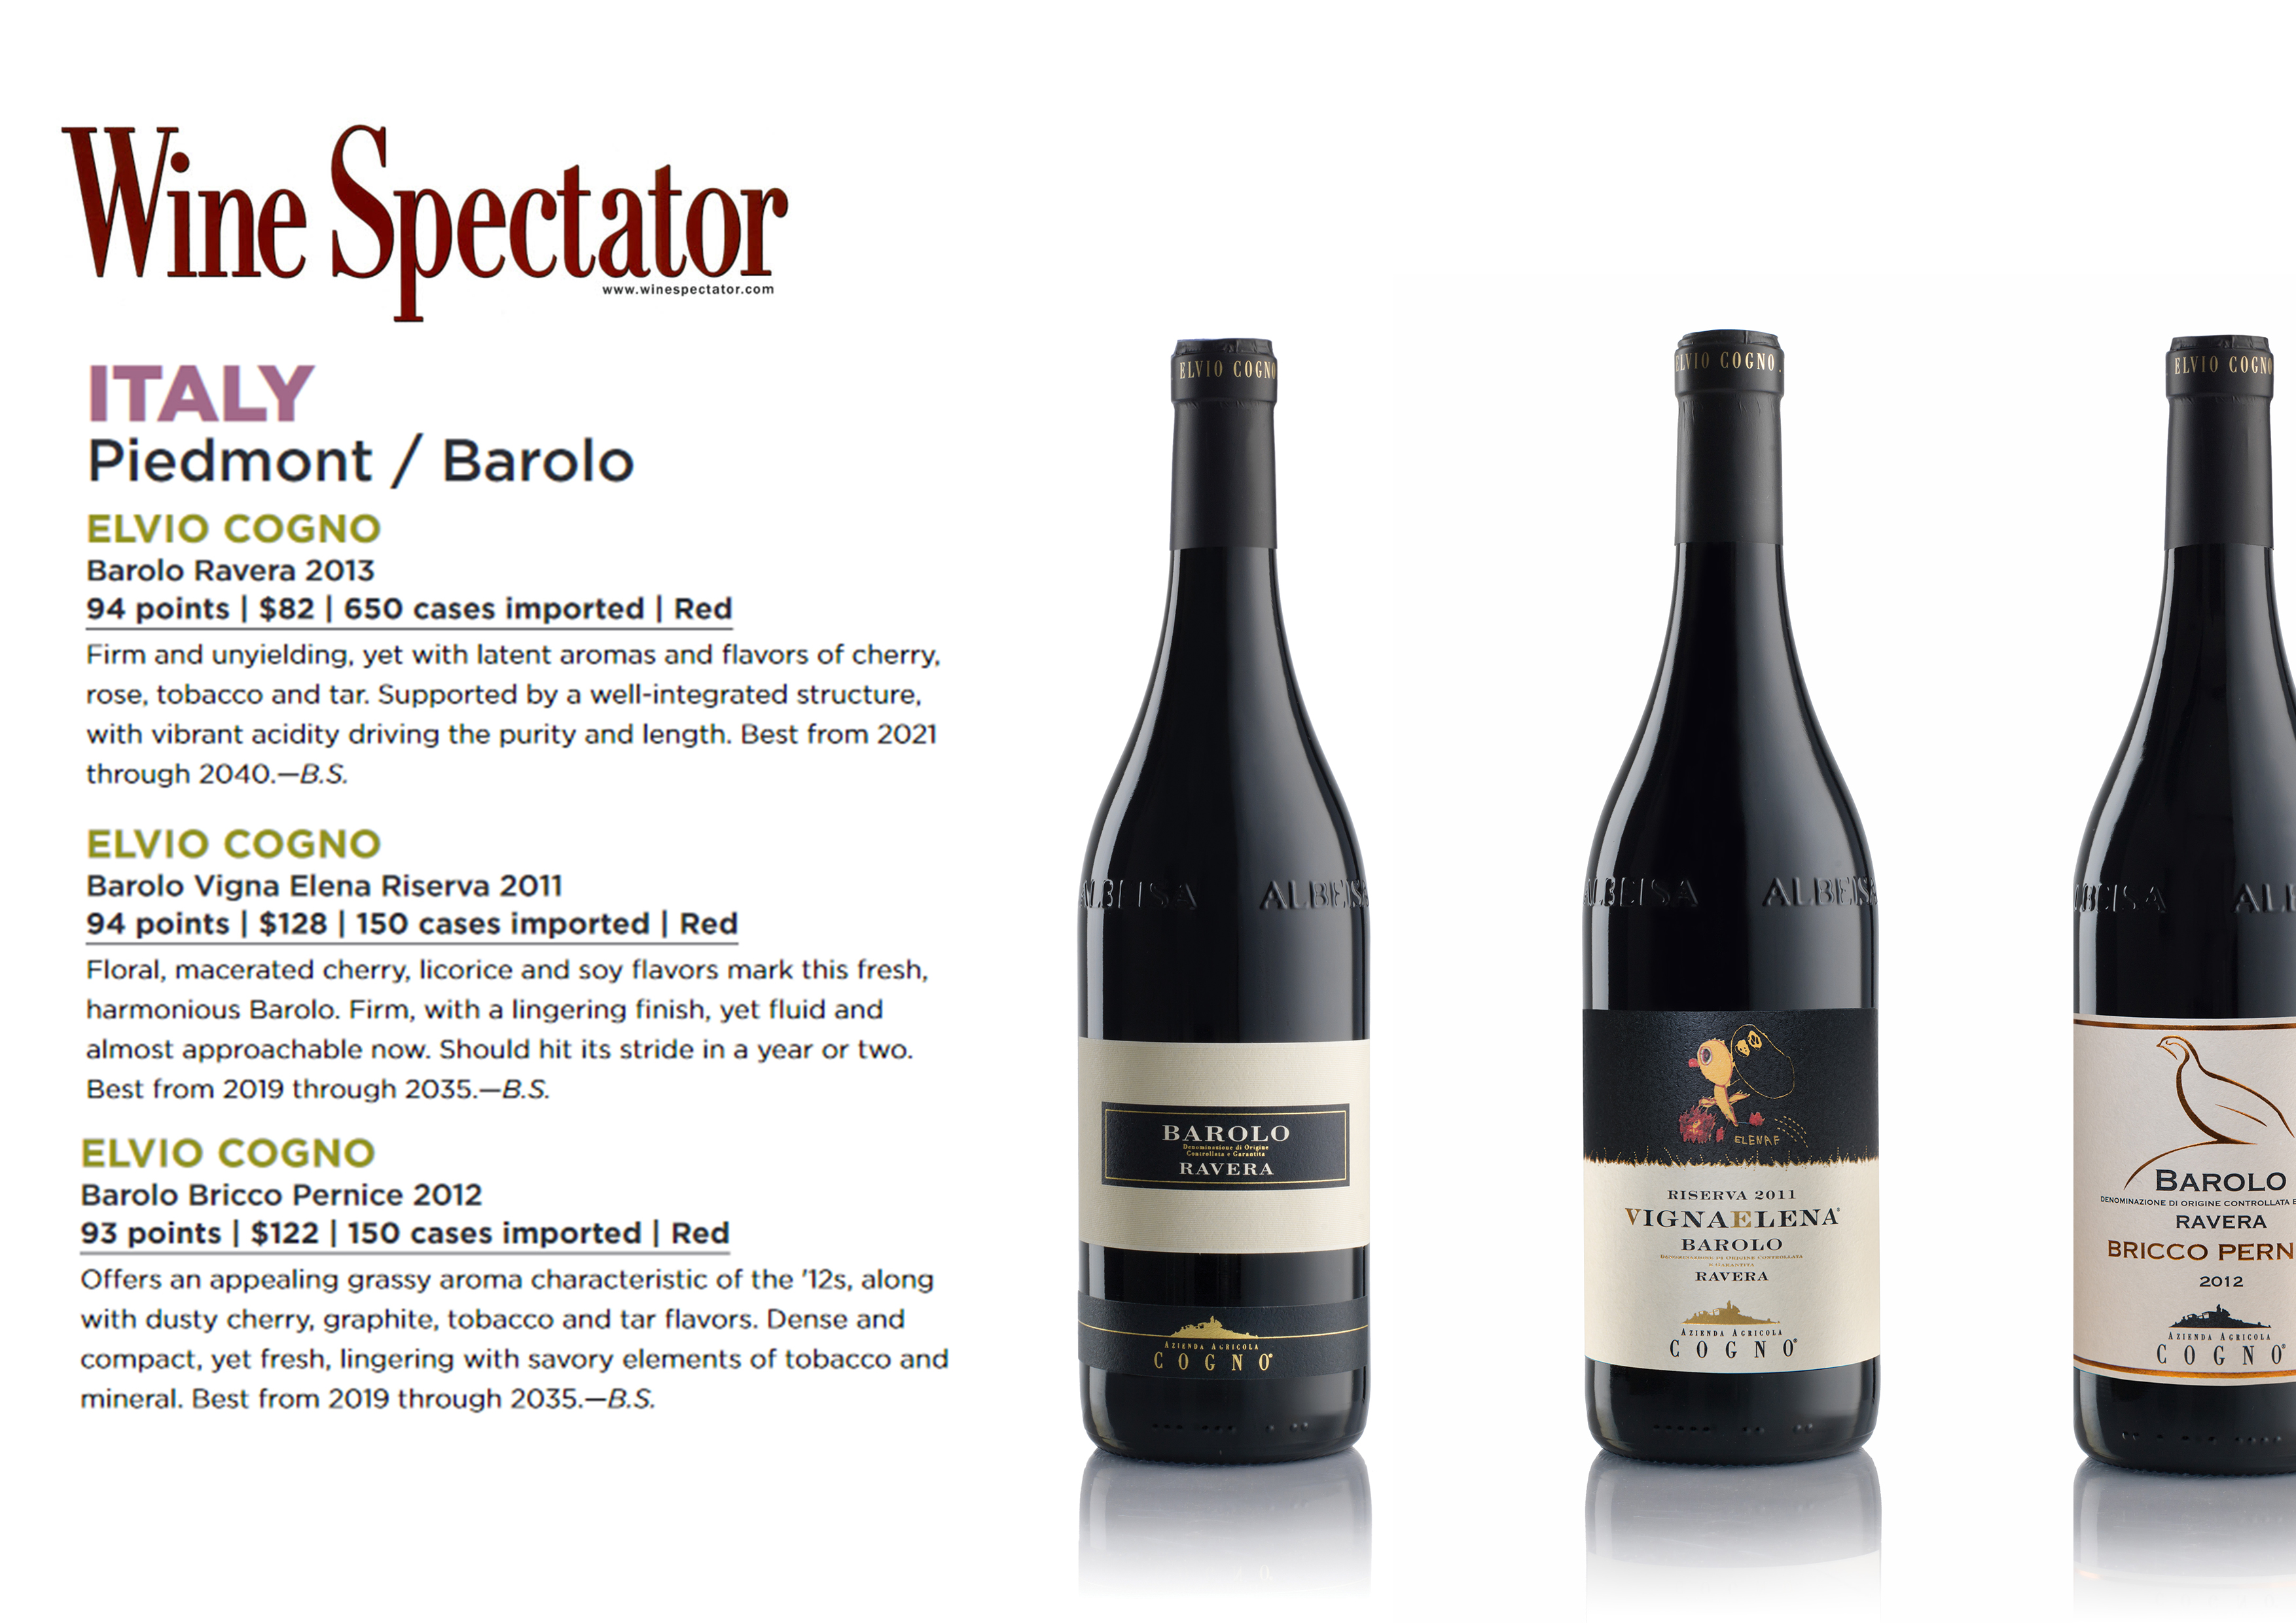 Wine Spectator – ITALY Piedmont/Barolo